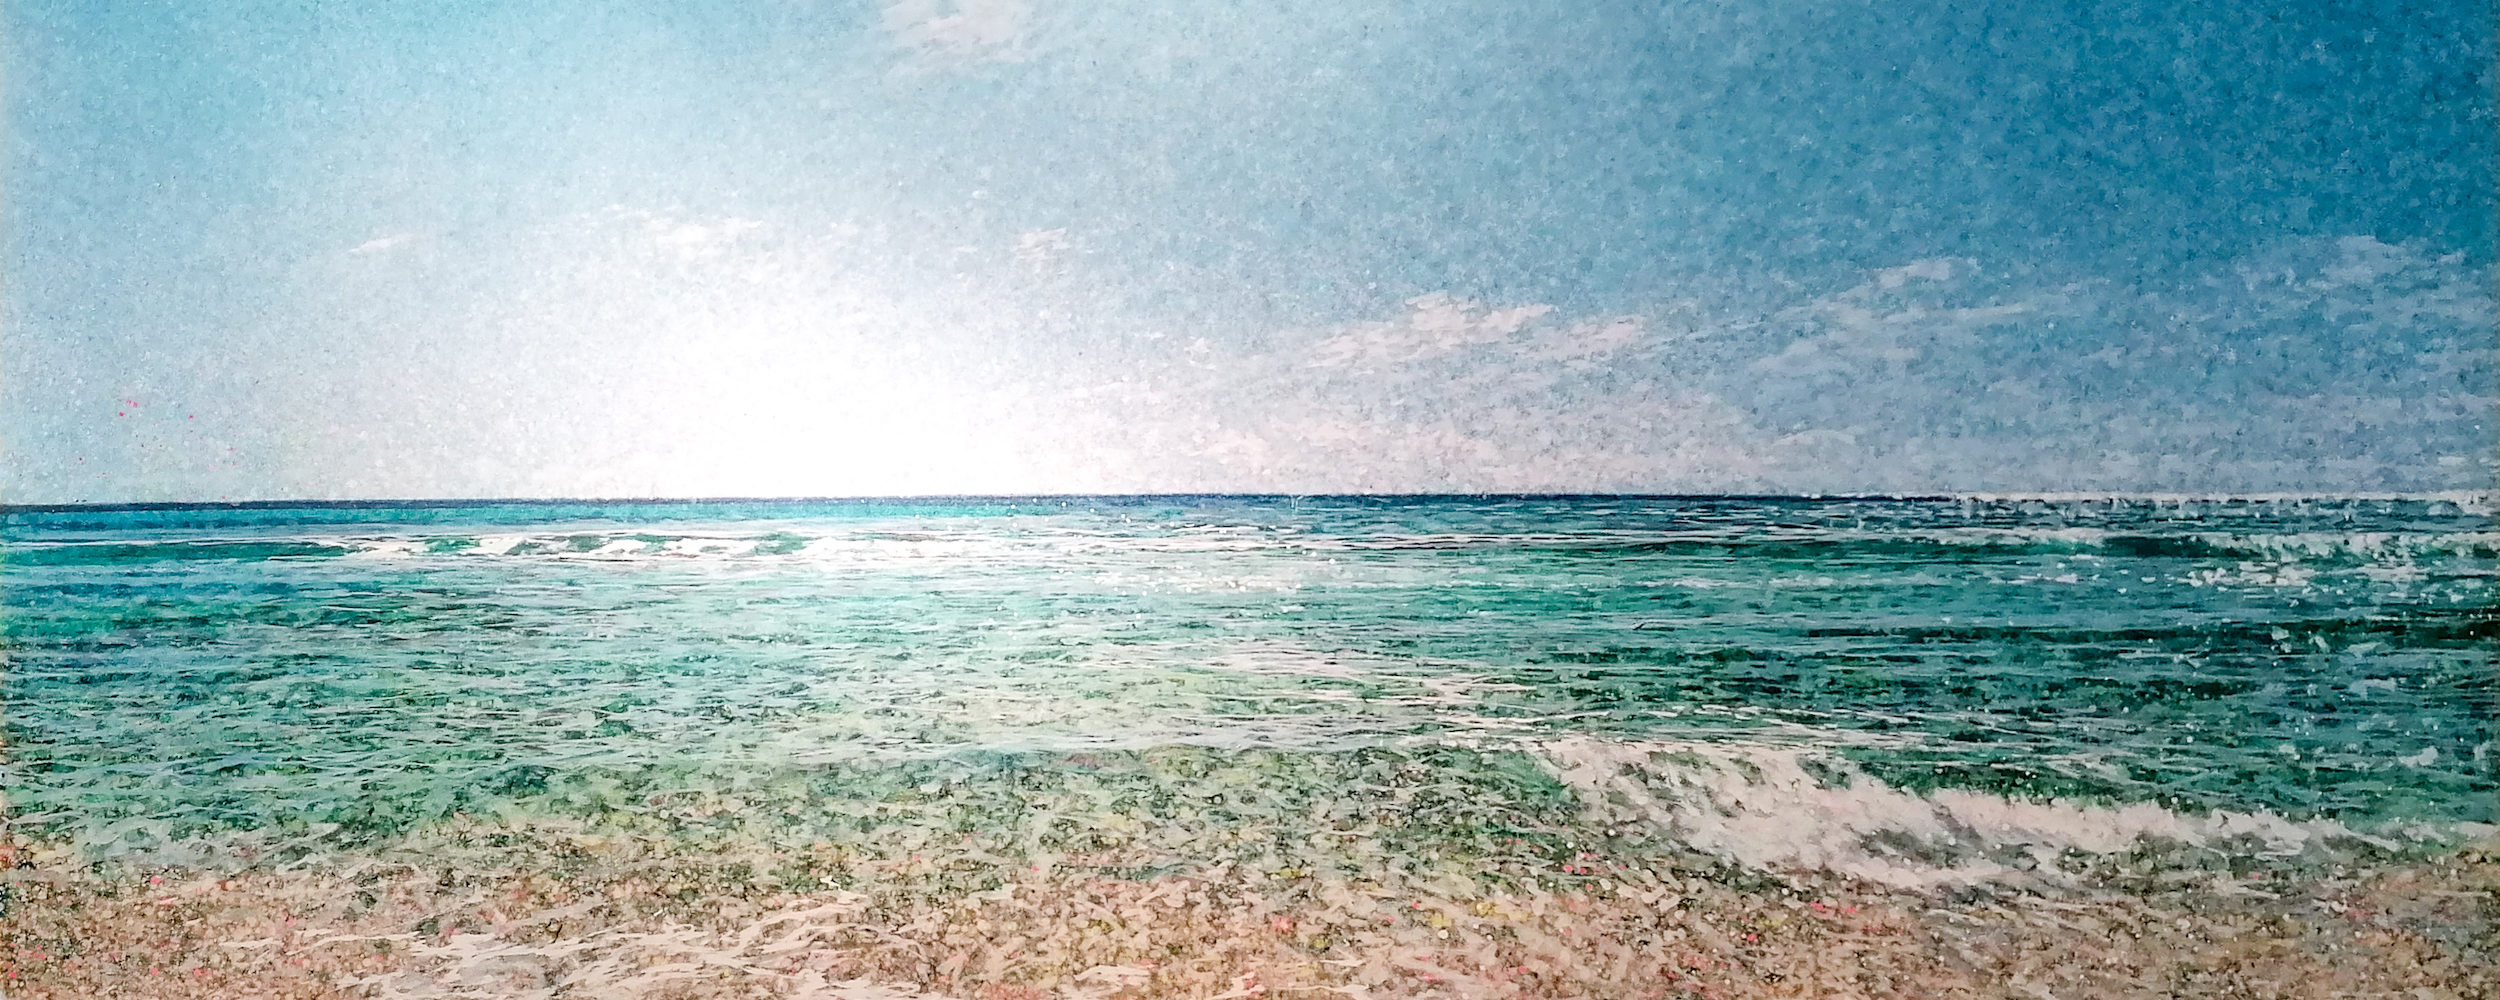 Robert Arató: Seascape 3, Druck auf Leinwand, gefirnisst, 190 x 120 cm, 1.750 Eur